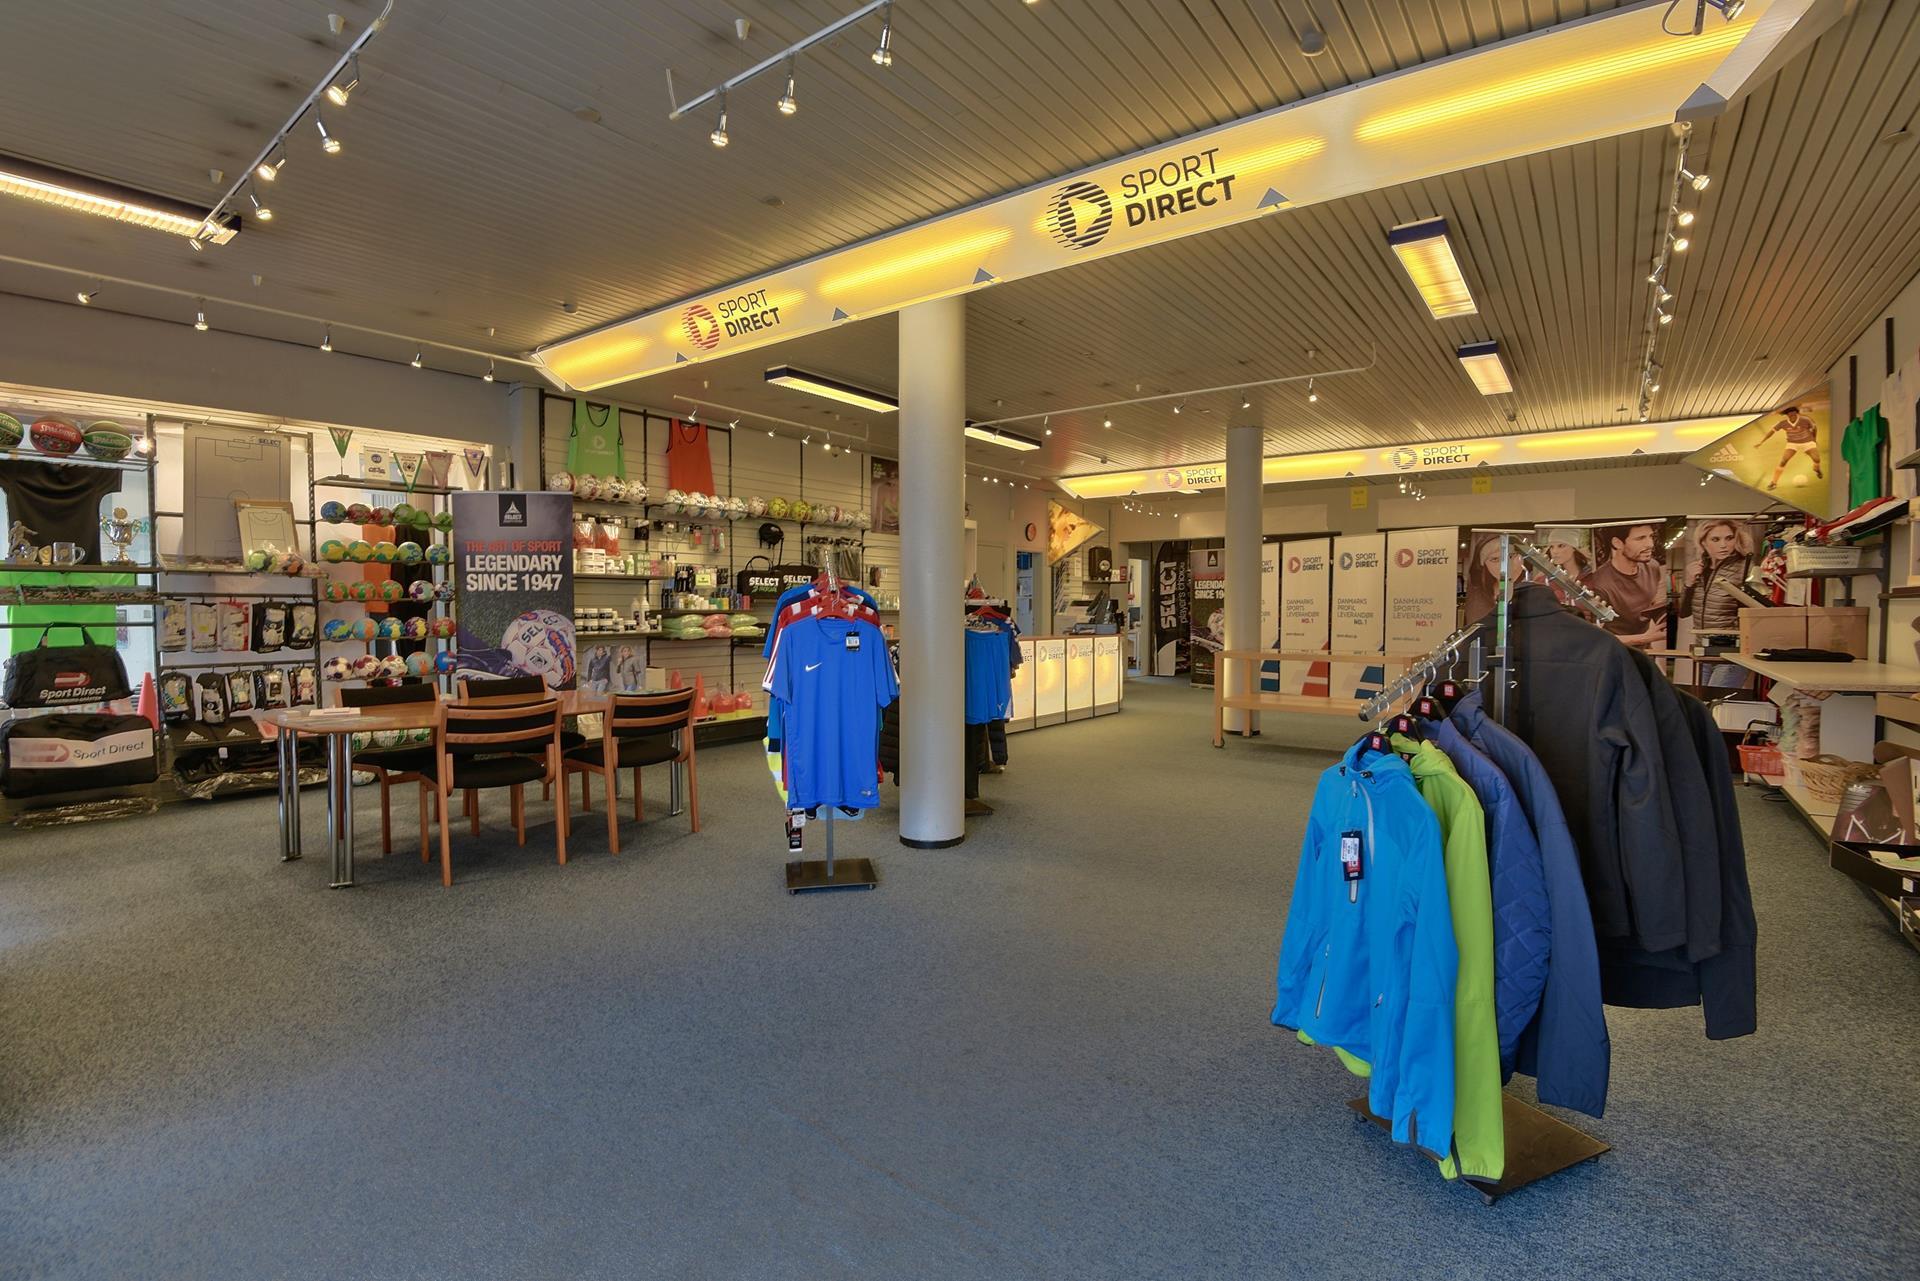 Bolig/erhverv på Nygade i Gråsten - Forretningslokale